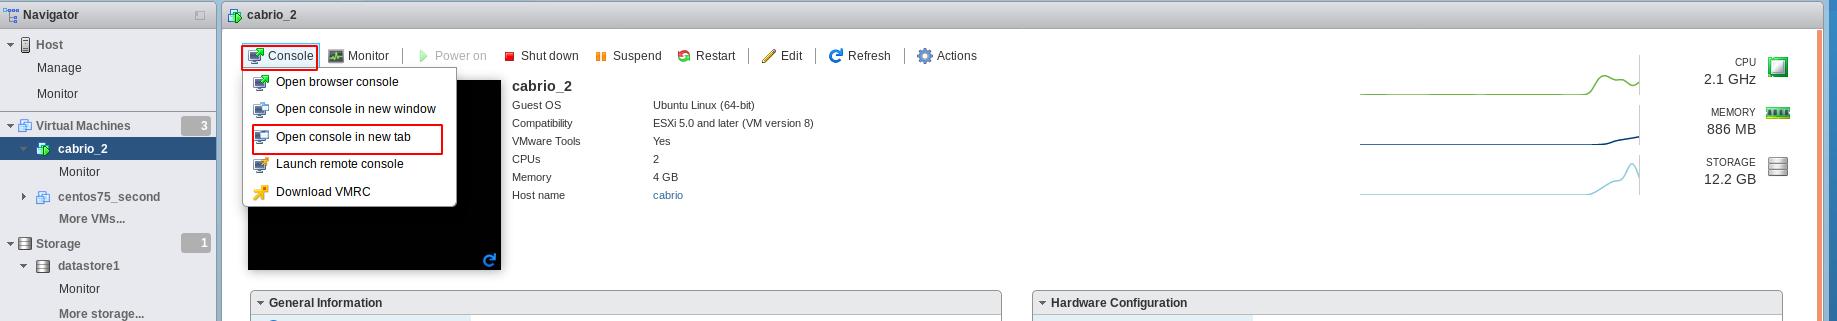 Hystax VMware Replication Agent VM console